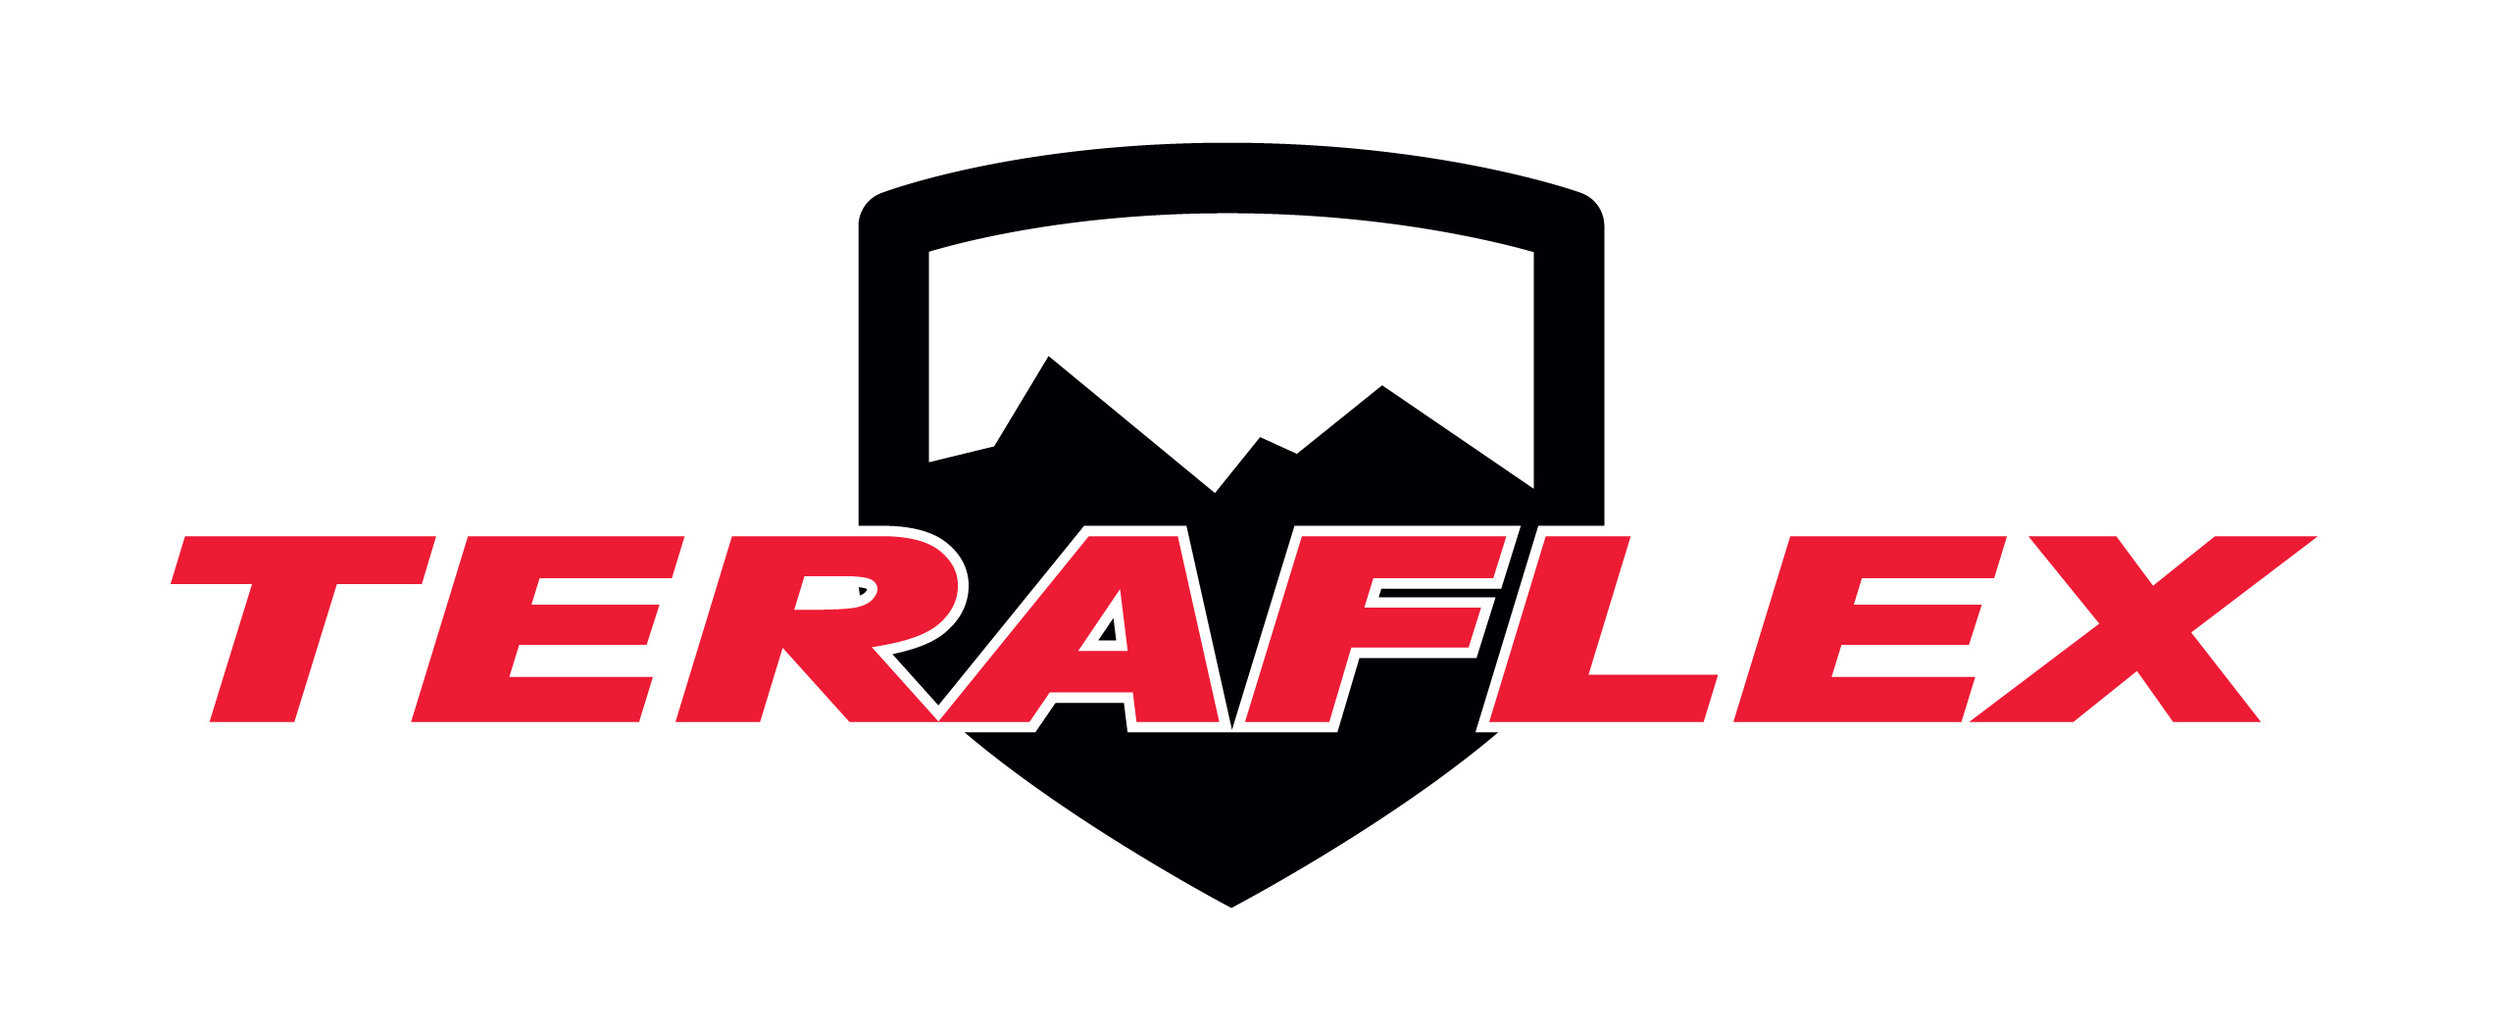 TeraFlex-color-logo badge.jpg